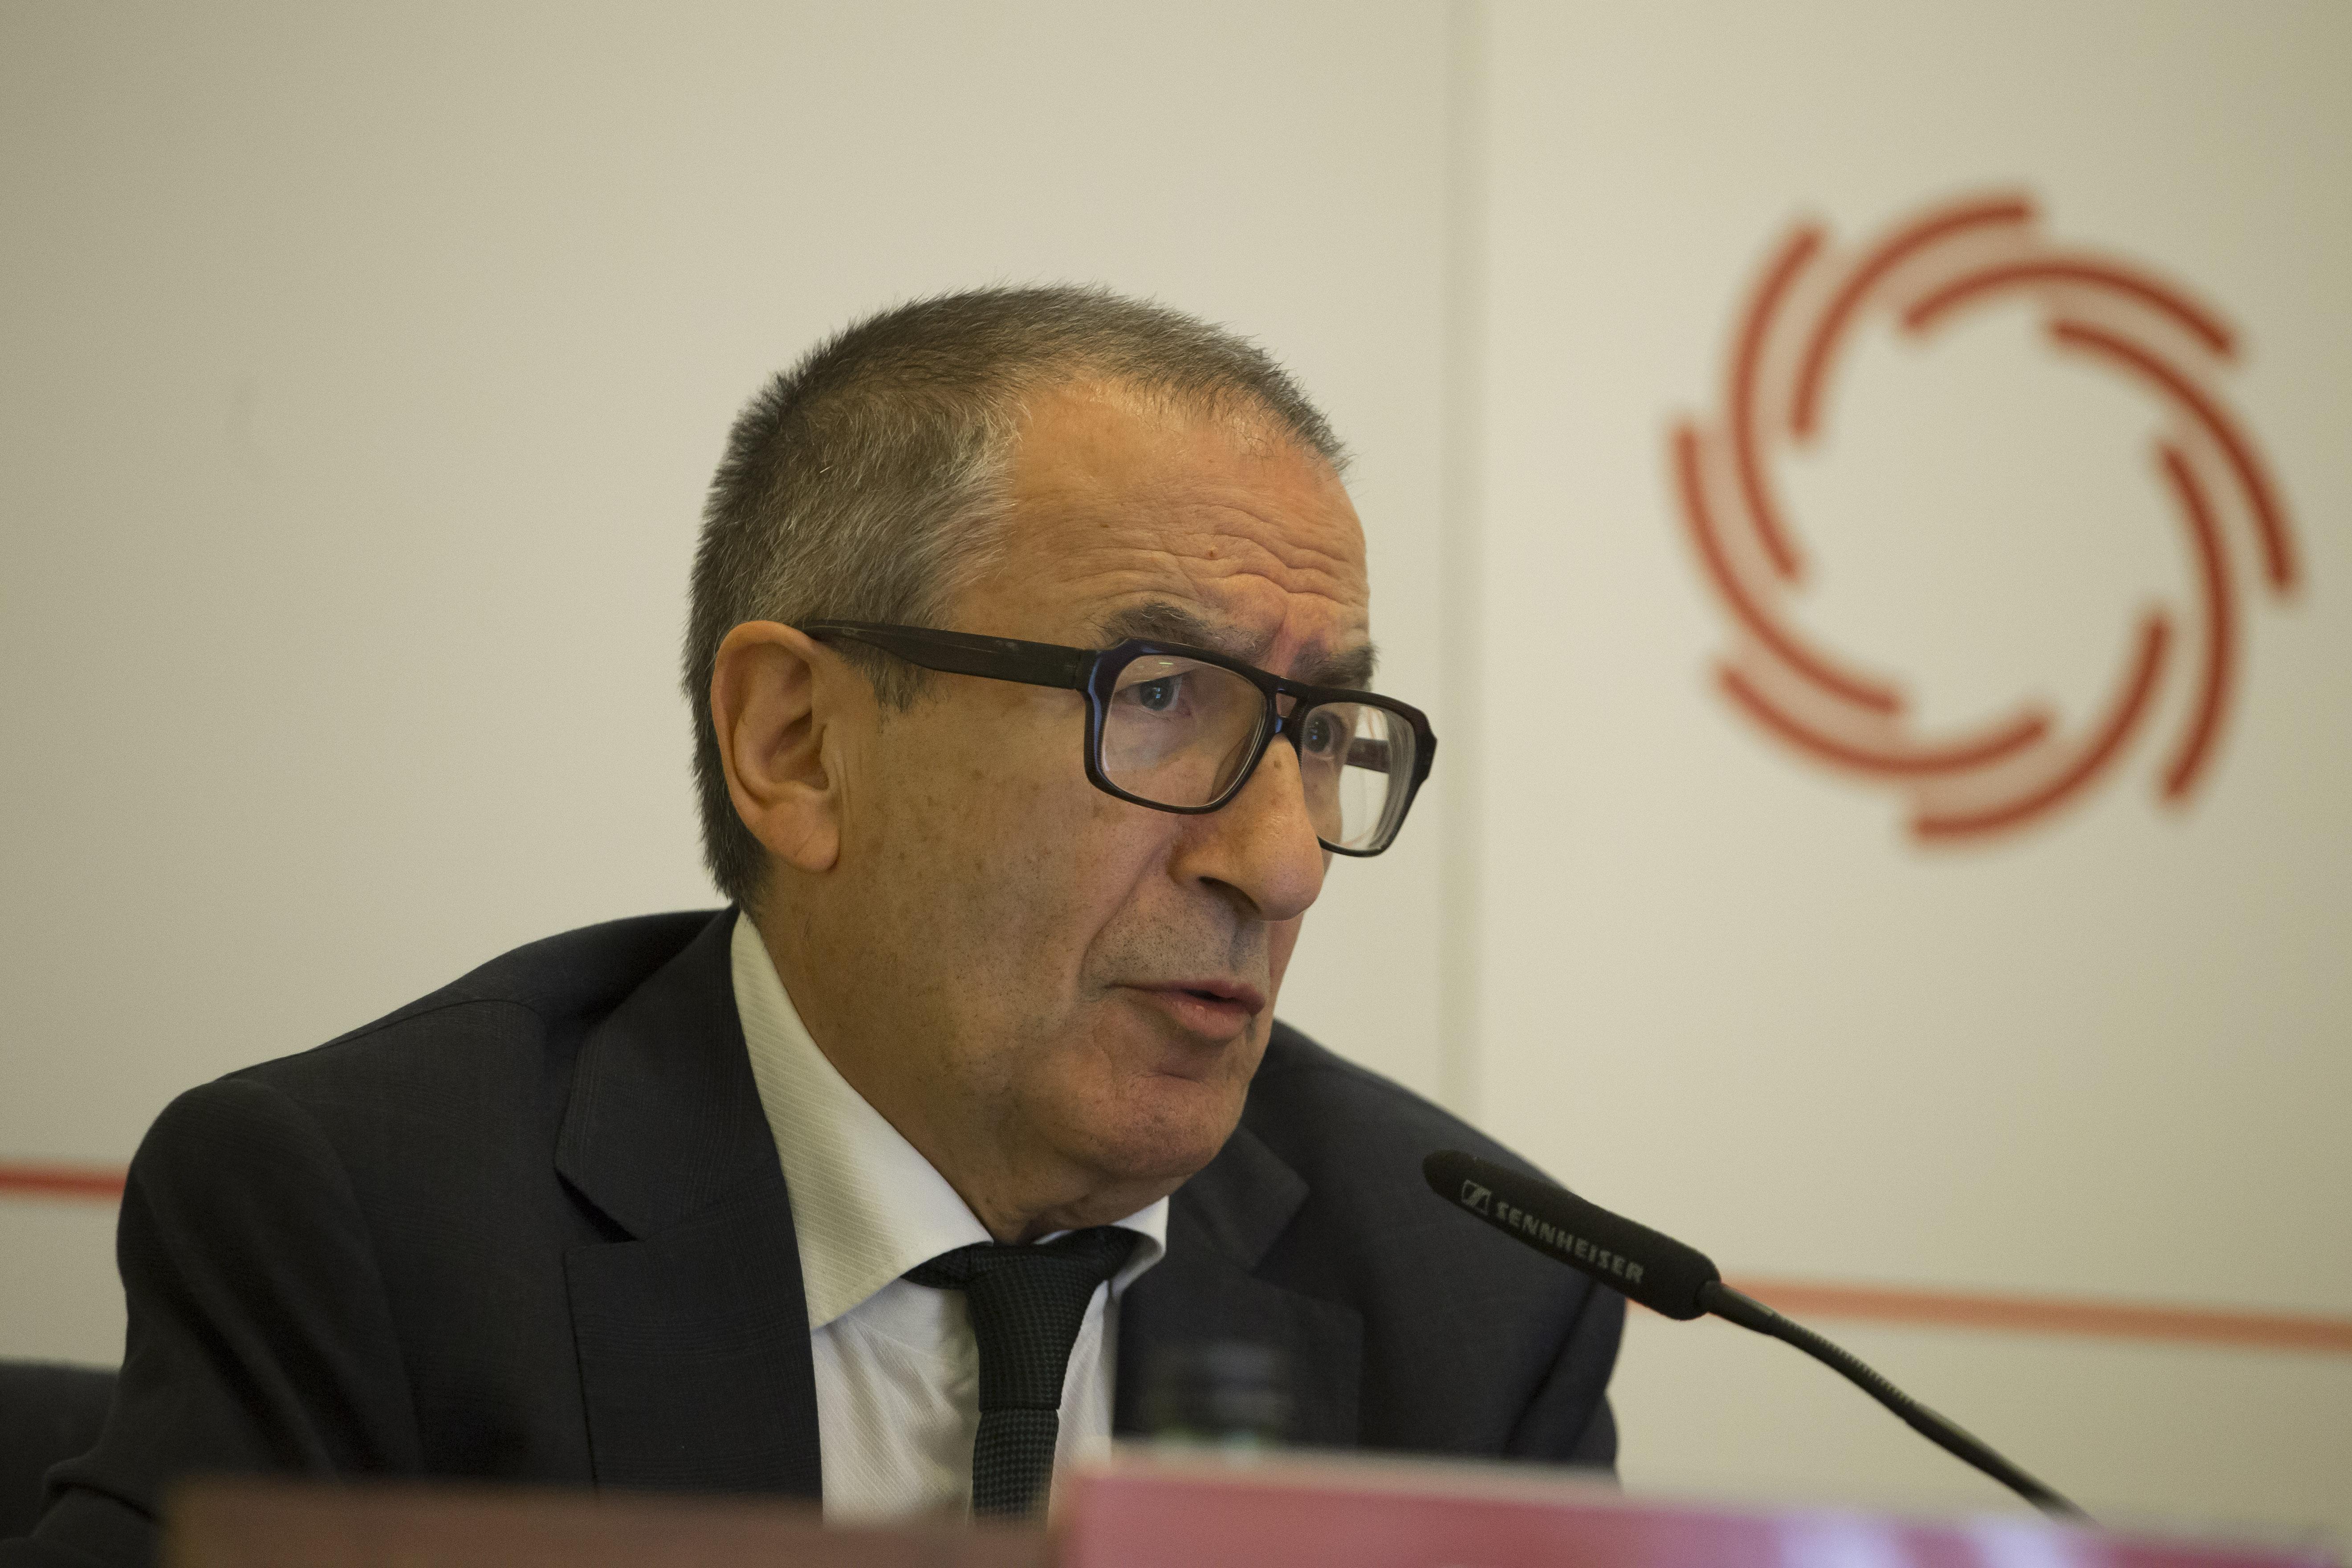 Juan Vila